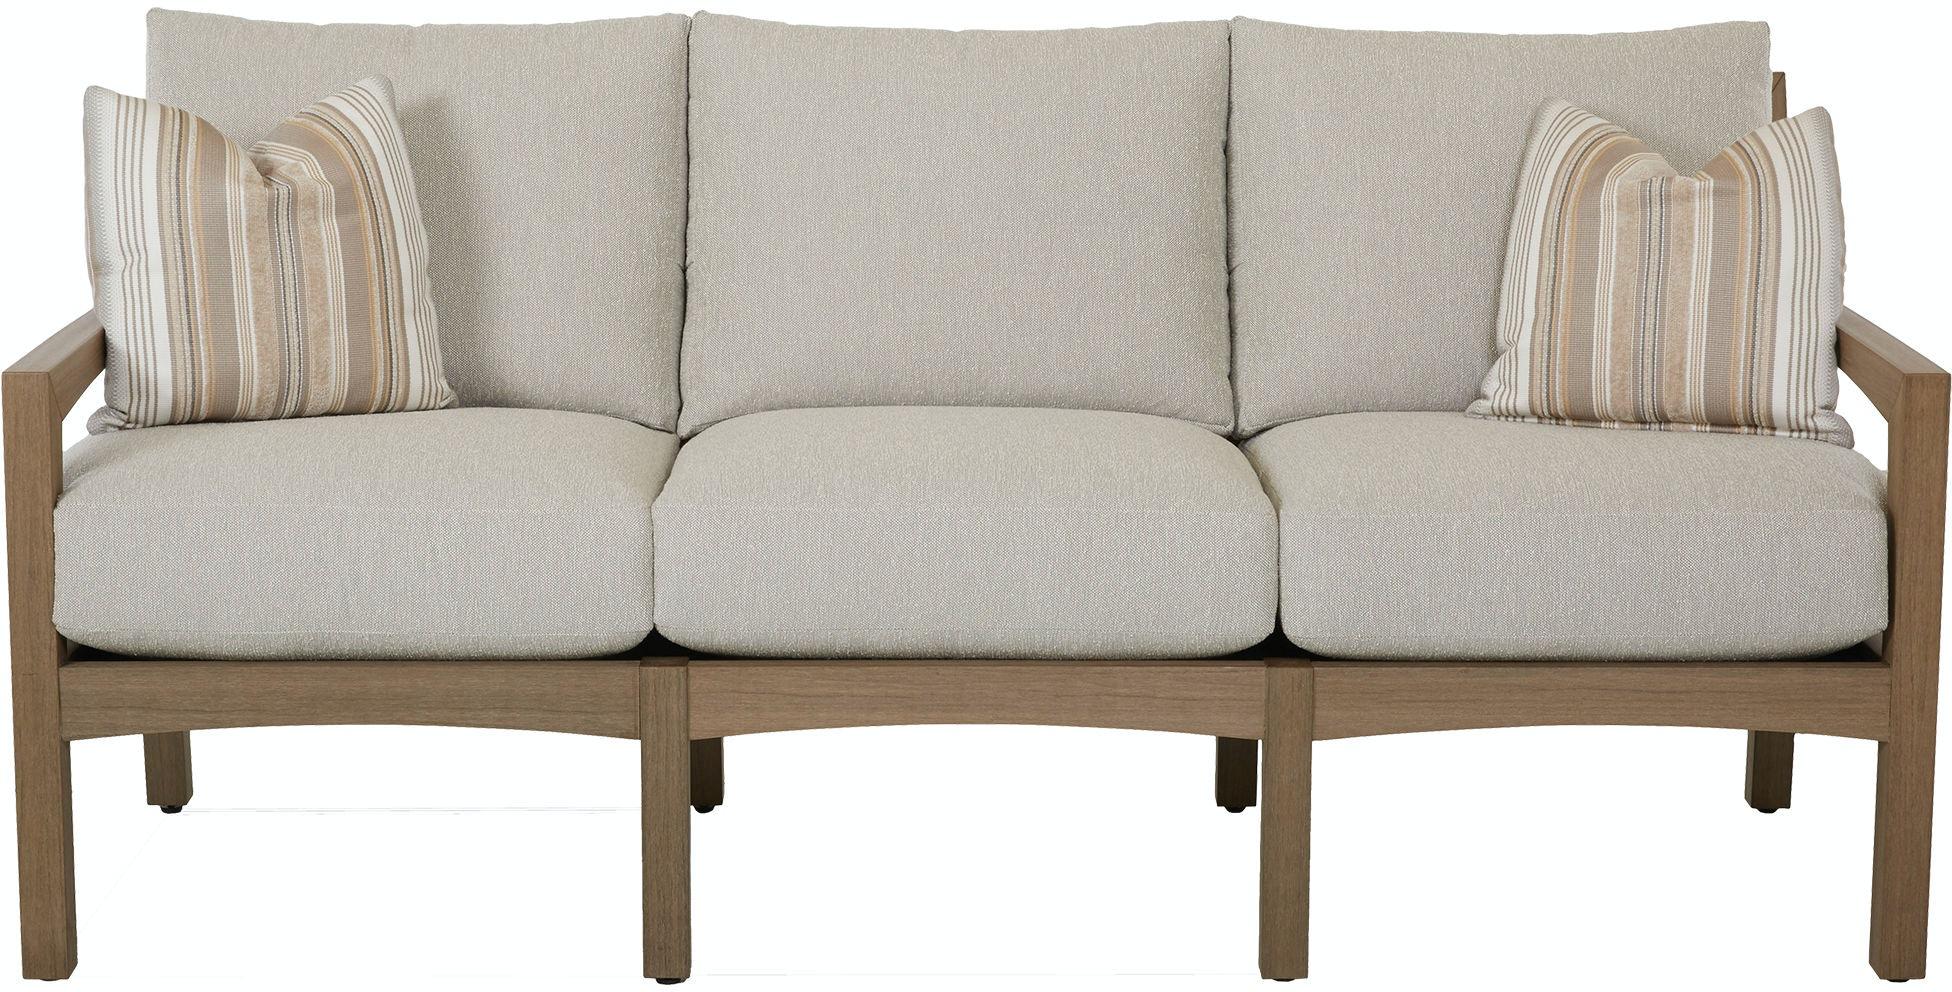 Klaussner Outdoor Outdoor Patio Delray Sofa W8502 S Zing